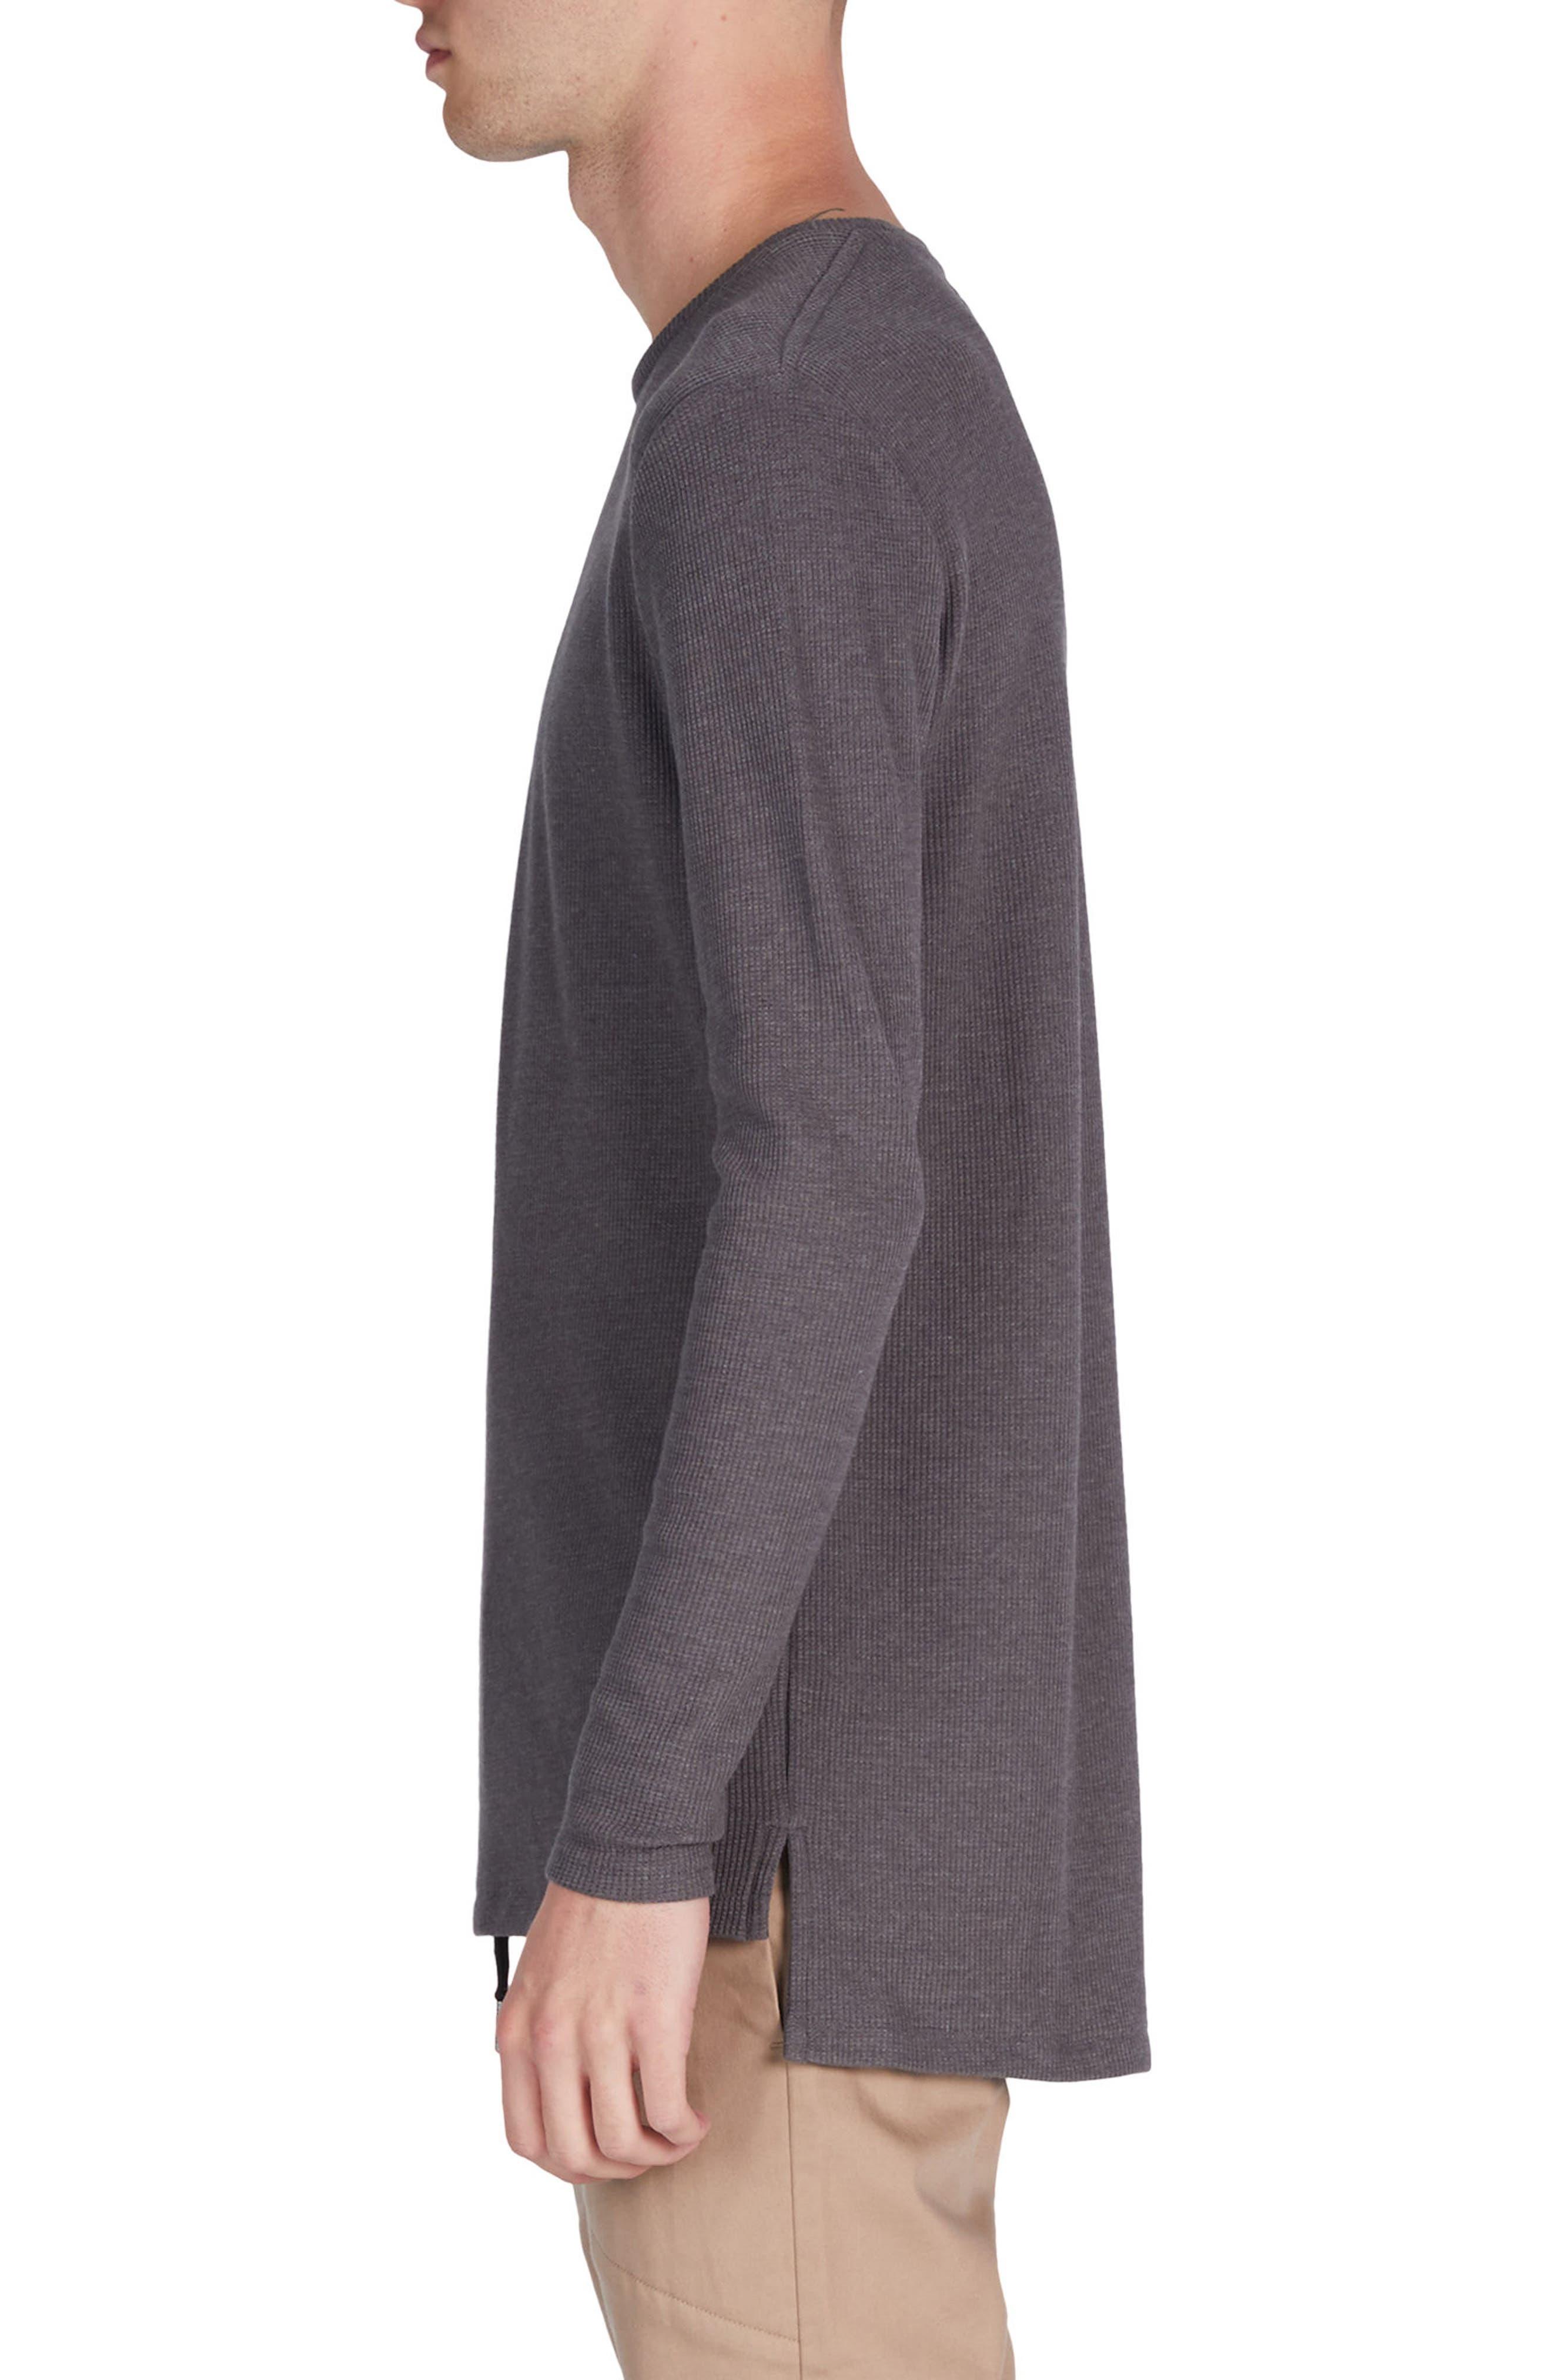 Flintlock Thermal T-Shirt,                             Alternate thumbnail 3, color,                             021